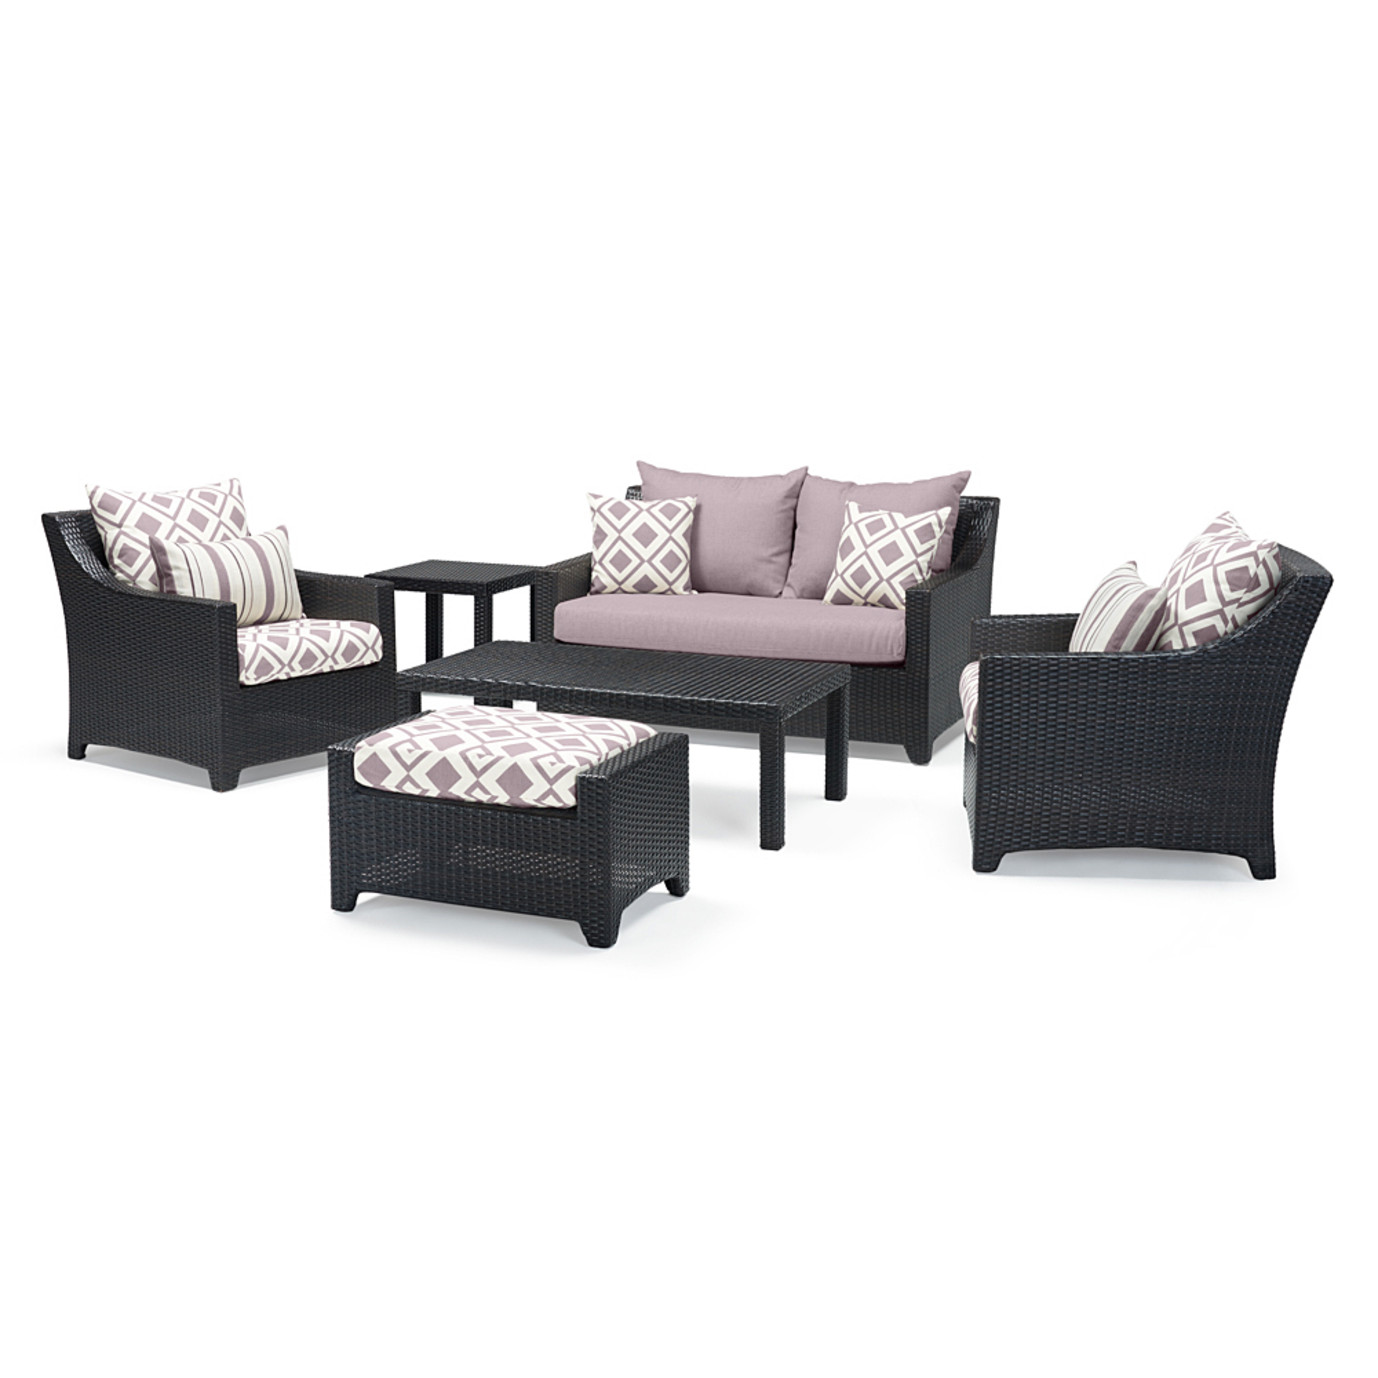 Deco™ 6 Piece Love & Club Seating Set - Wisteria Lavender